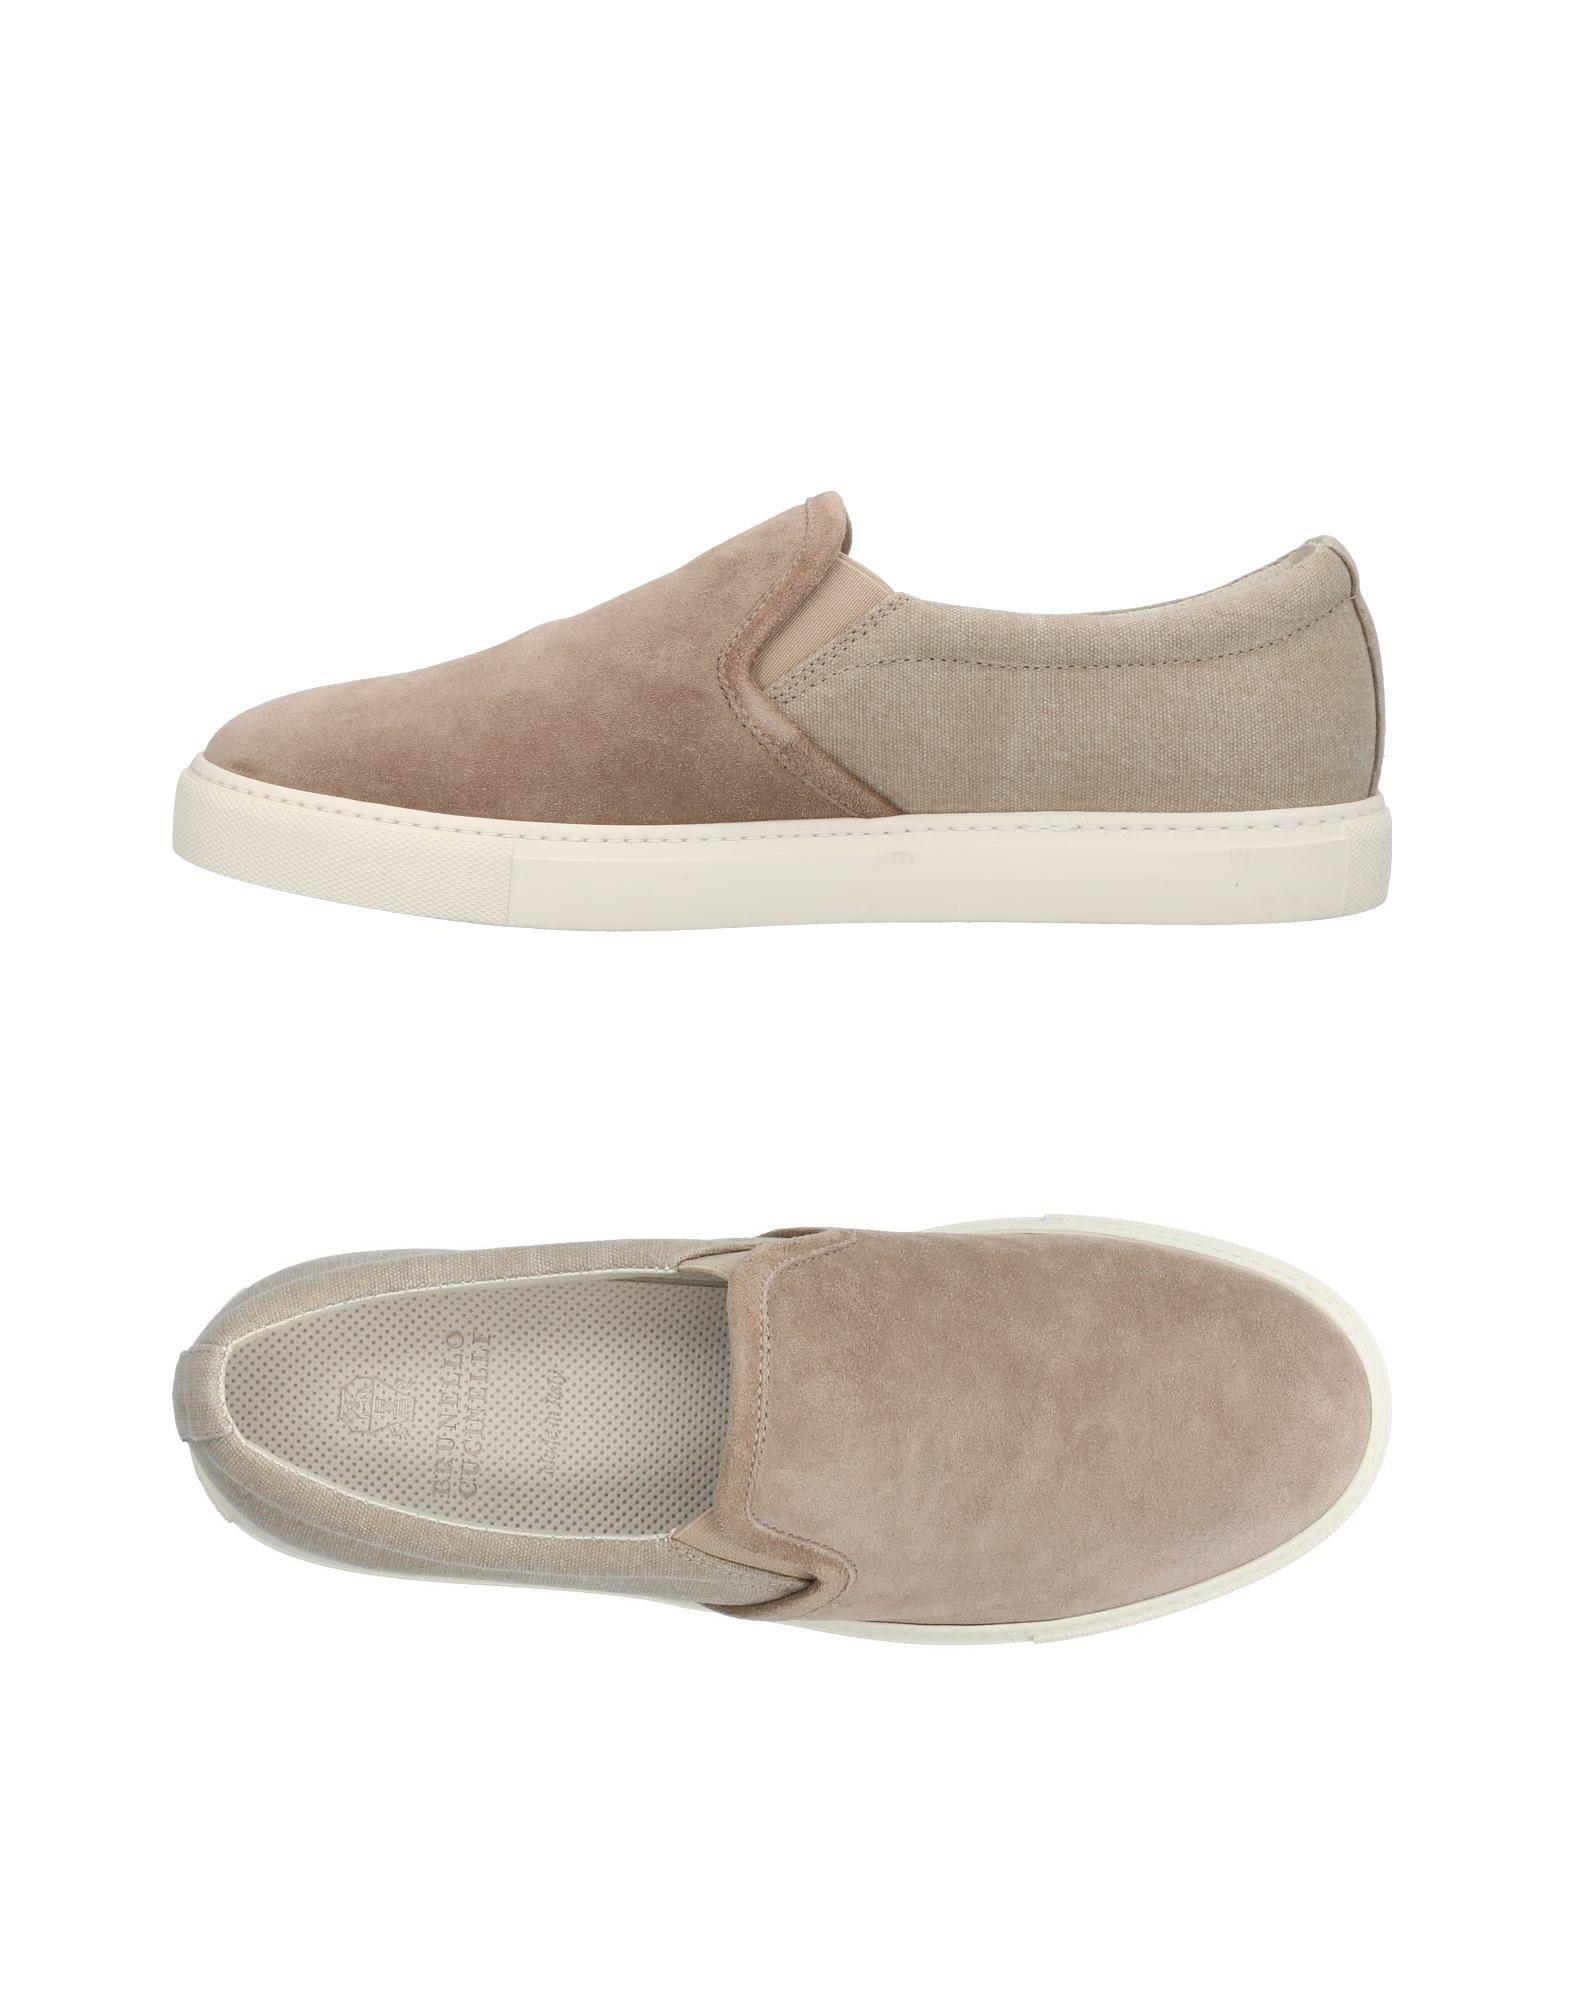 Brunello Cucinelli Sneakers Herren  11397172WX Gute Qualität beliebte Schuhe